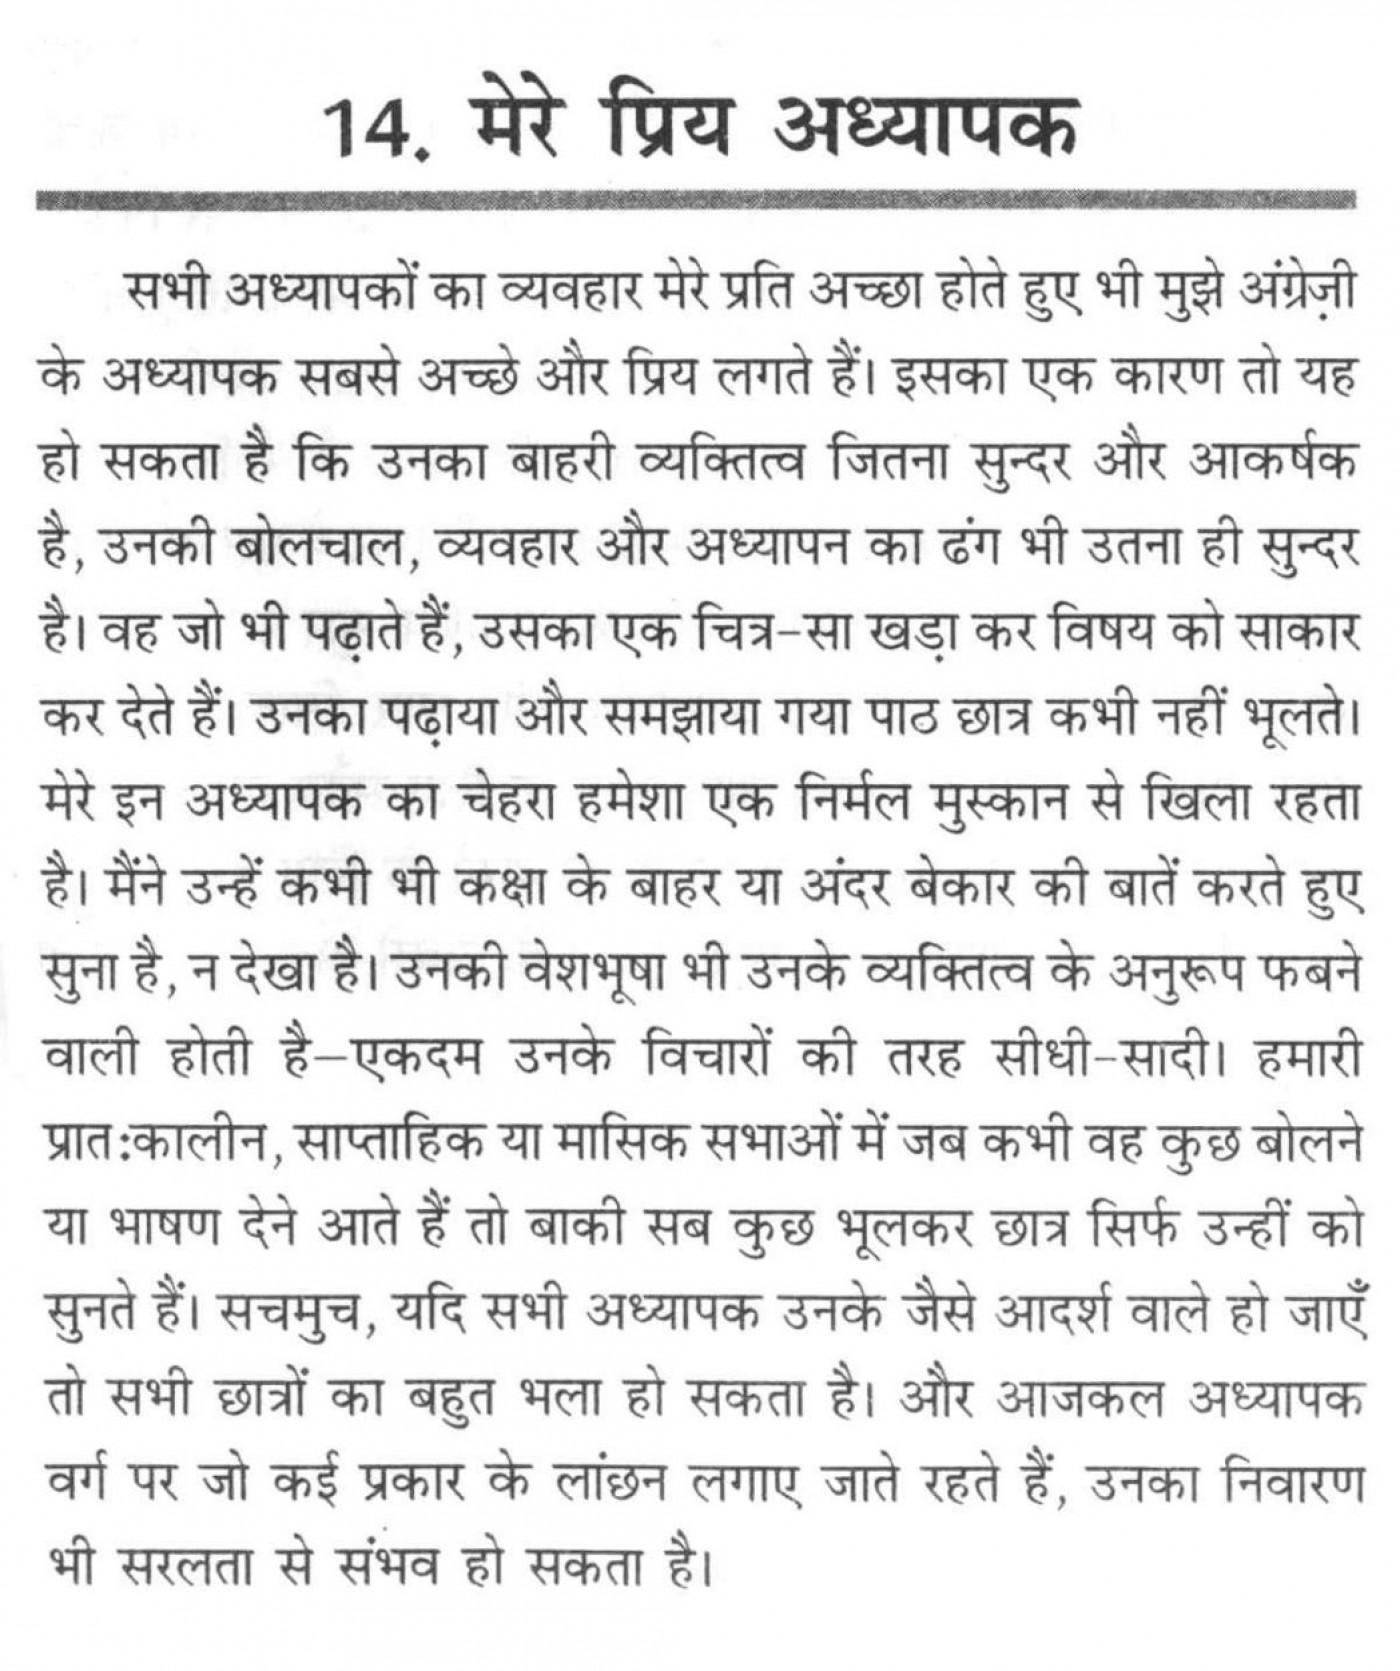 007 Qualities Of Good Friend Essay Buying Student Pdf In Telugu Punjabi Successful English Traits Leader Words Hindi Urdu 1048x1251 Example Amazing Friends A Short 1400